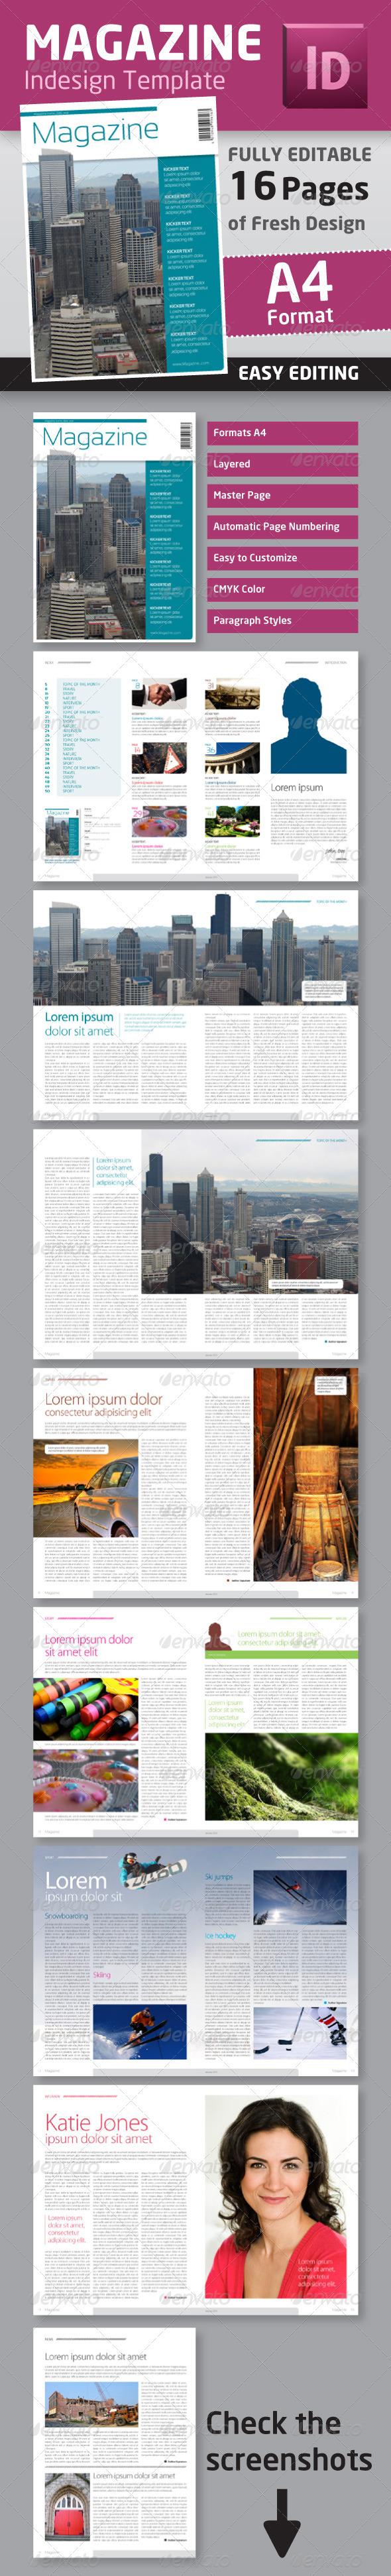 indesign magazine template in a4 format graphicriver. Black Bedroom Furniture Sets. Home Design Ideas